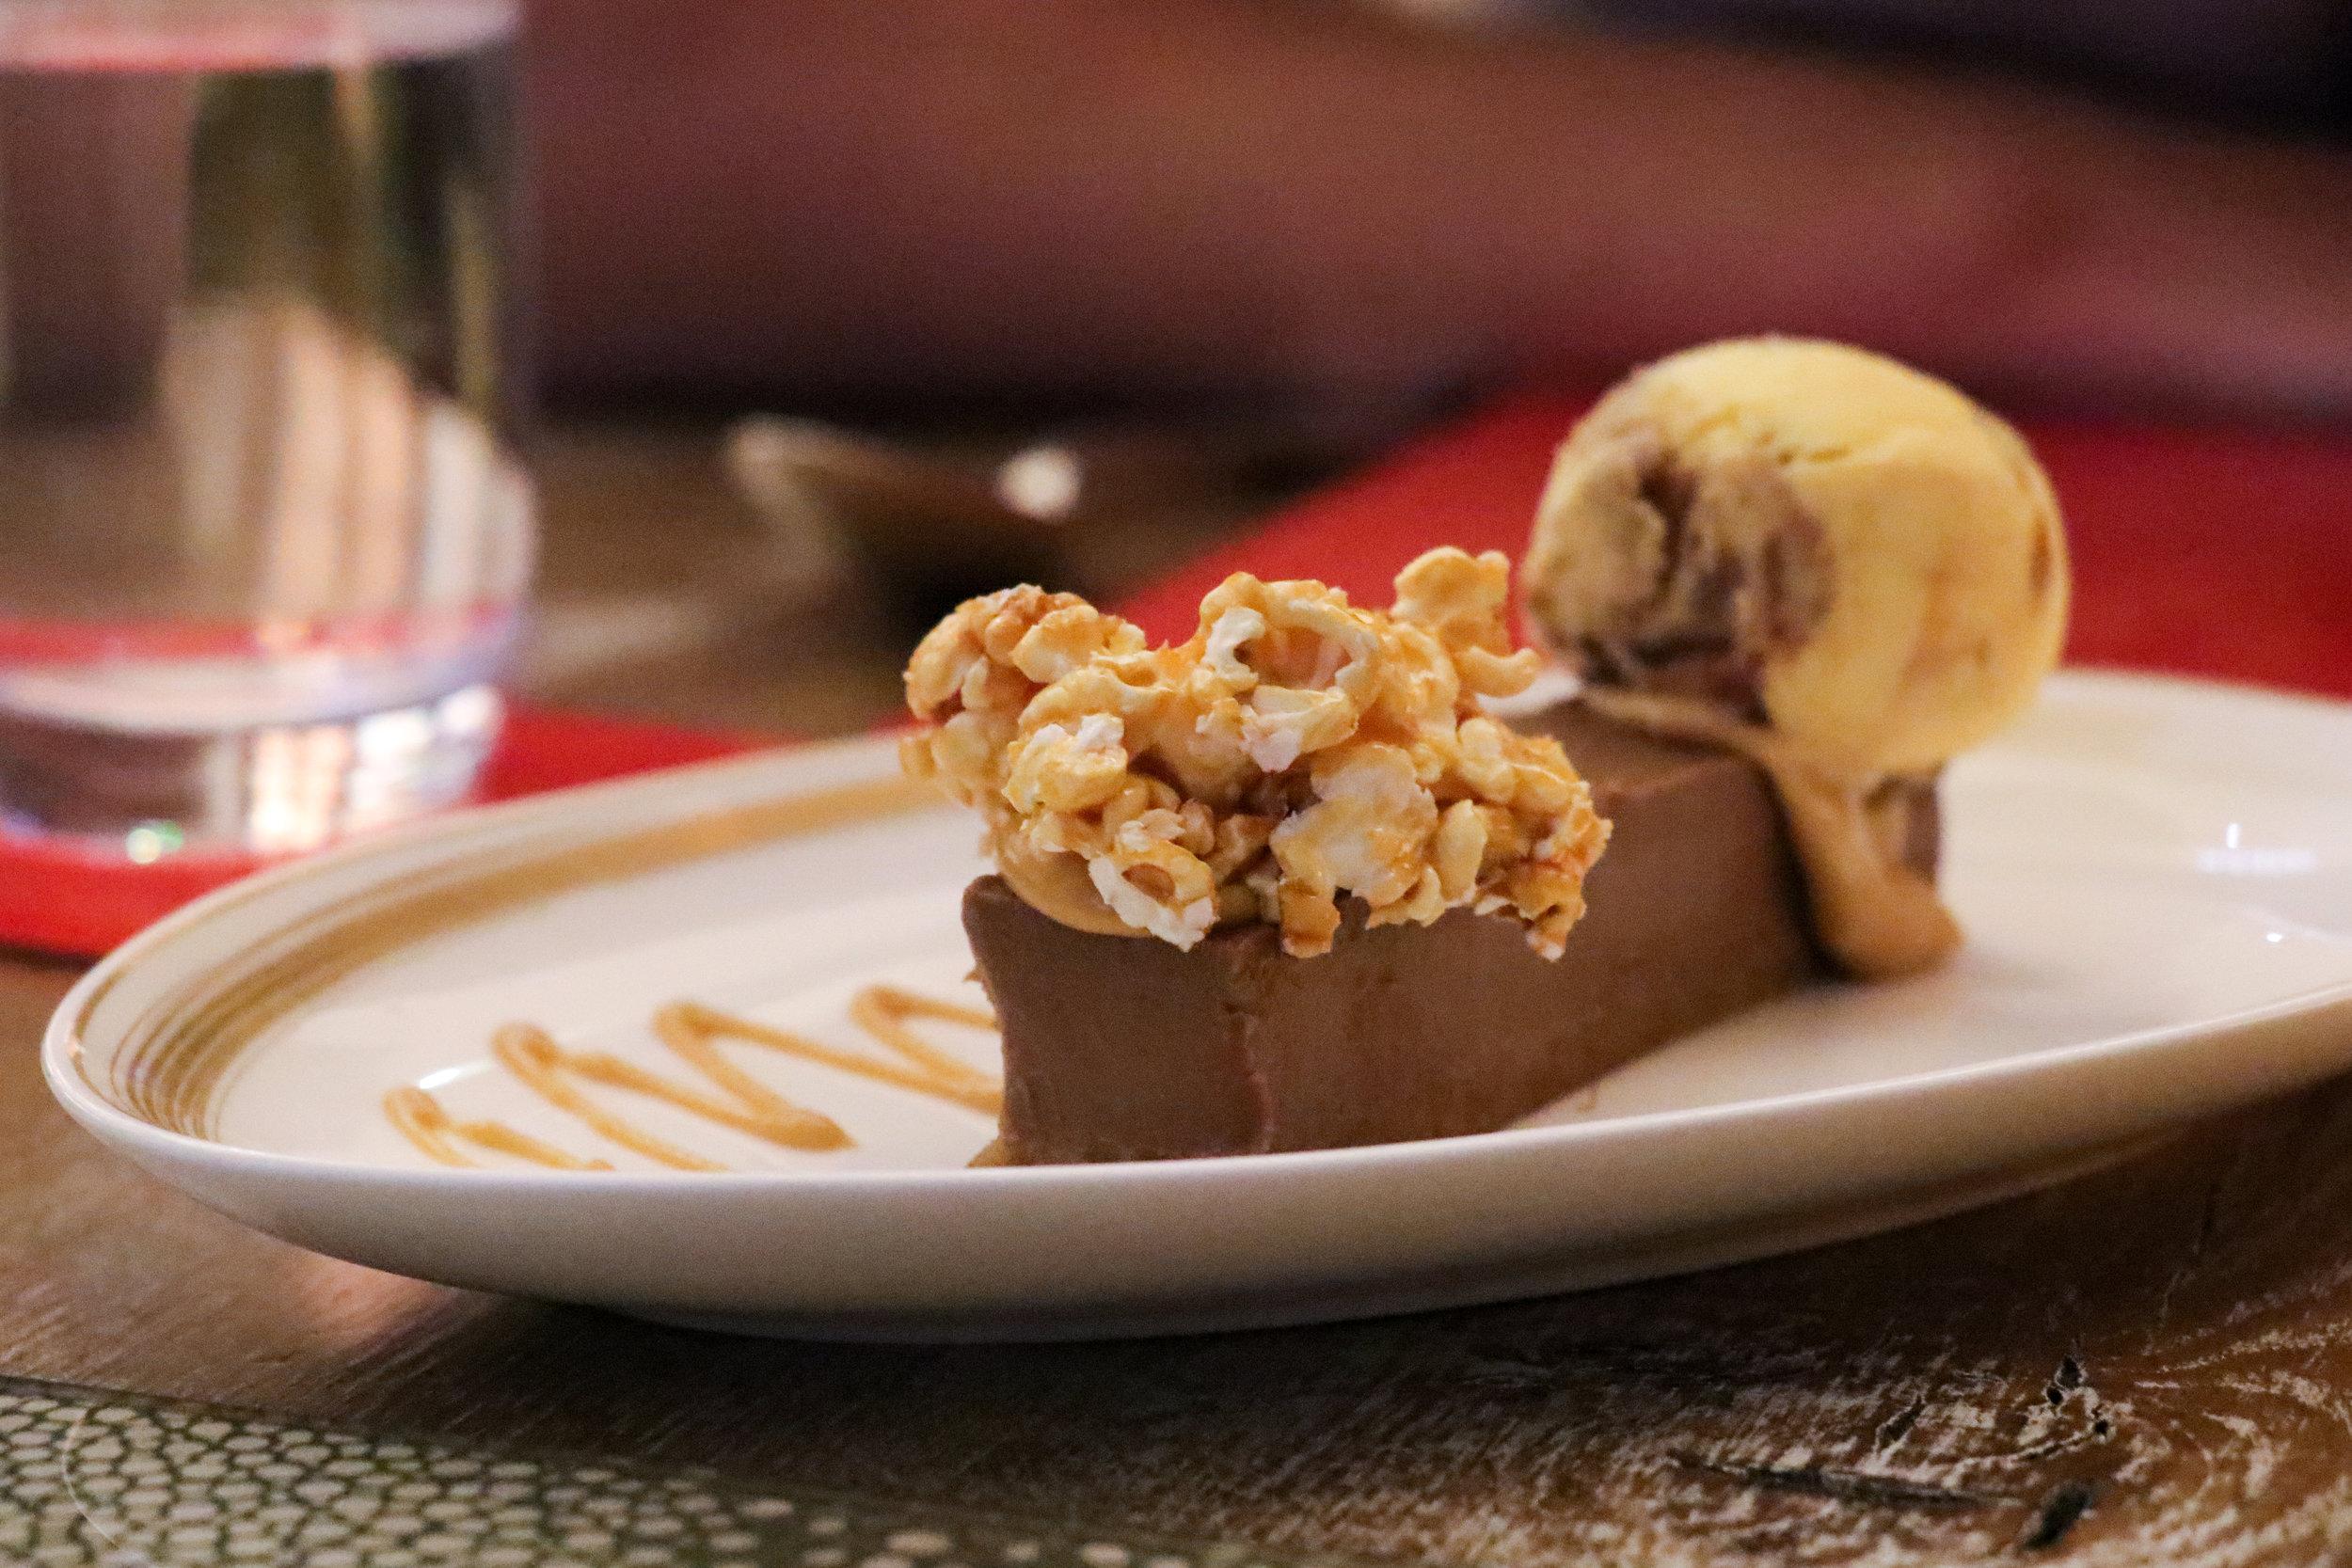 'Dark Chocolate Delice, Salted Popcorn, Banana Ice-Cream' (£7.50) to share!